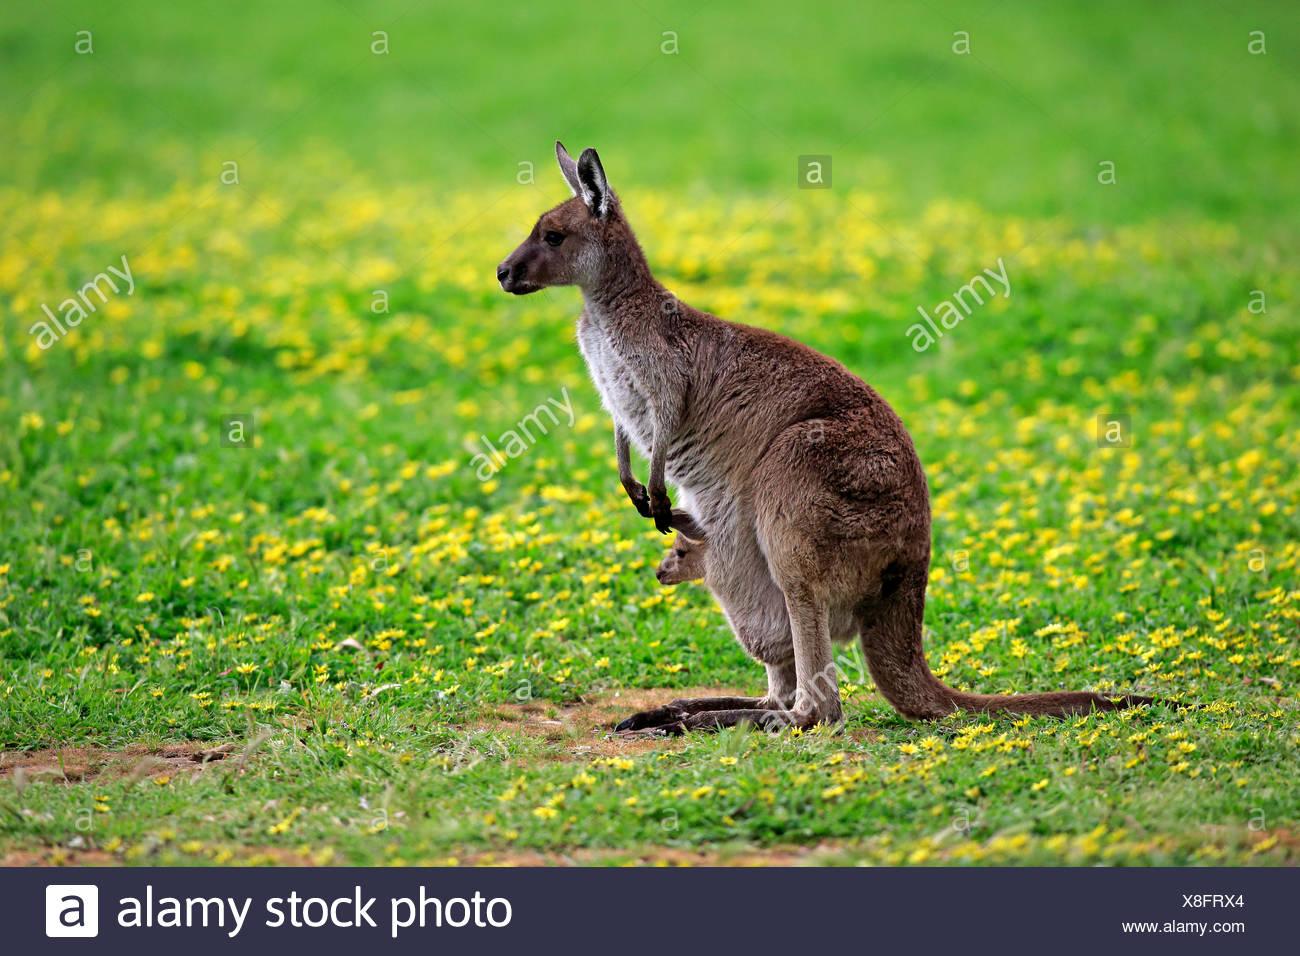 Kangaroo Island Kangaroos (Macropus fuliginosus fuliginosus), female with joey in the pouch, South Australia, Australia Stock Photo